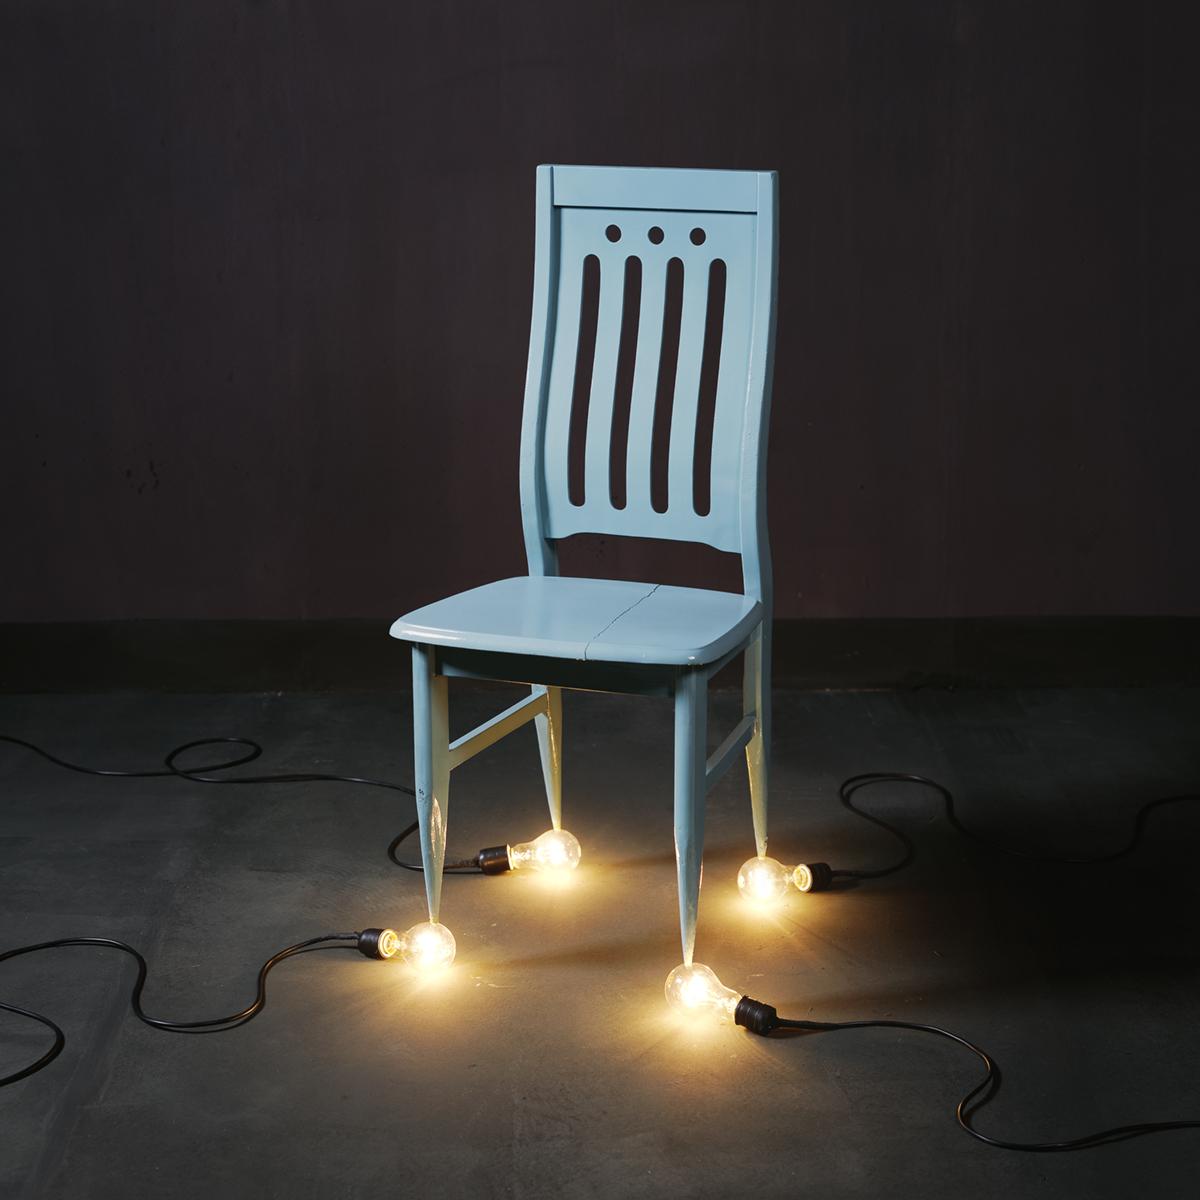 Chen Wei 陈维, A Chair and Four 100 Watt Bulbs, 2010, Archival inkjet print 收藏级艺术微喷, 100 x 100 cm